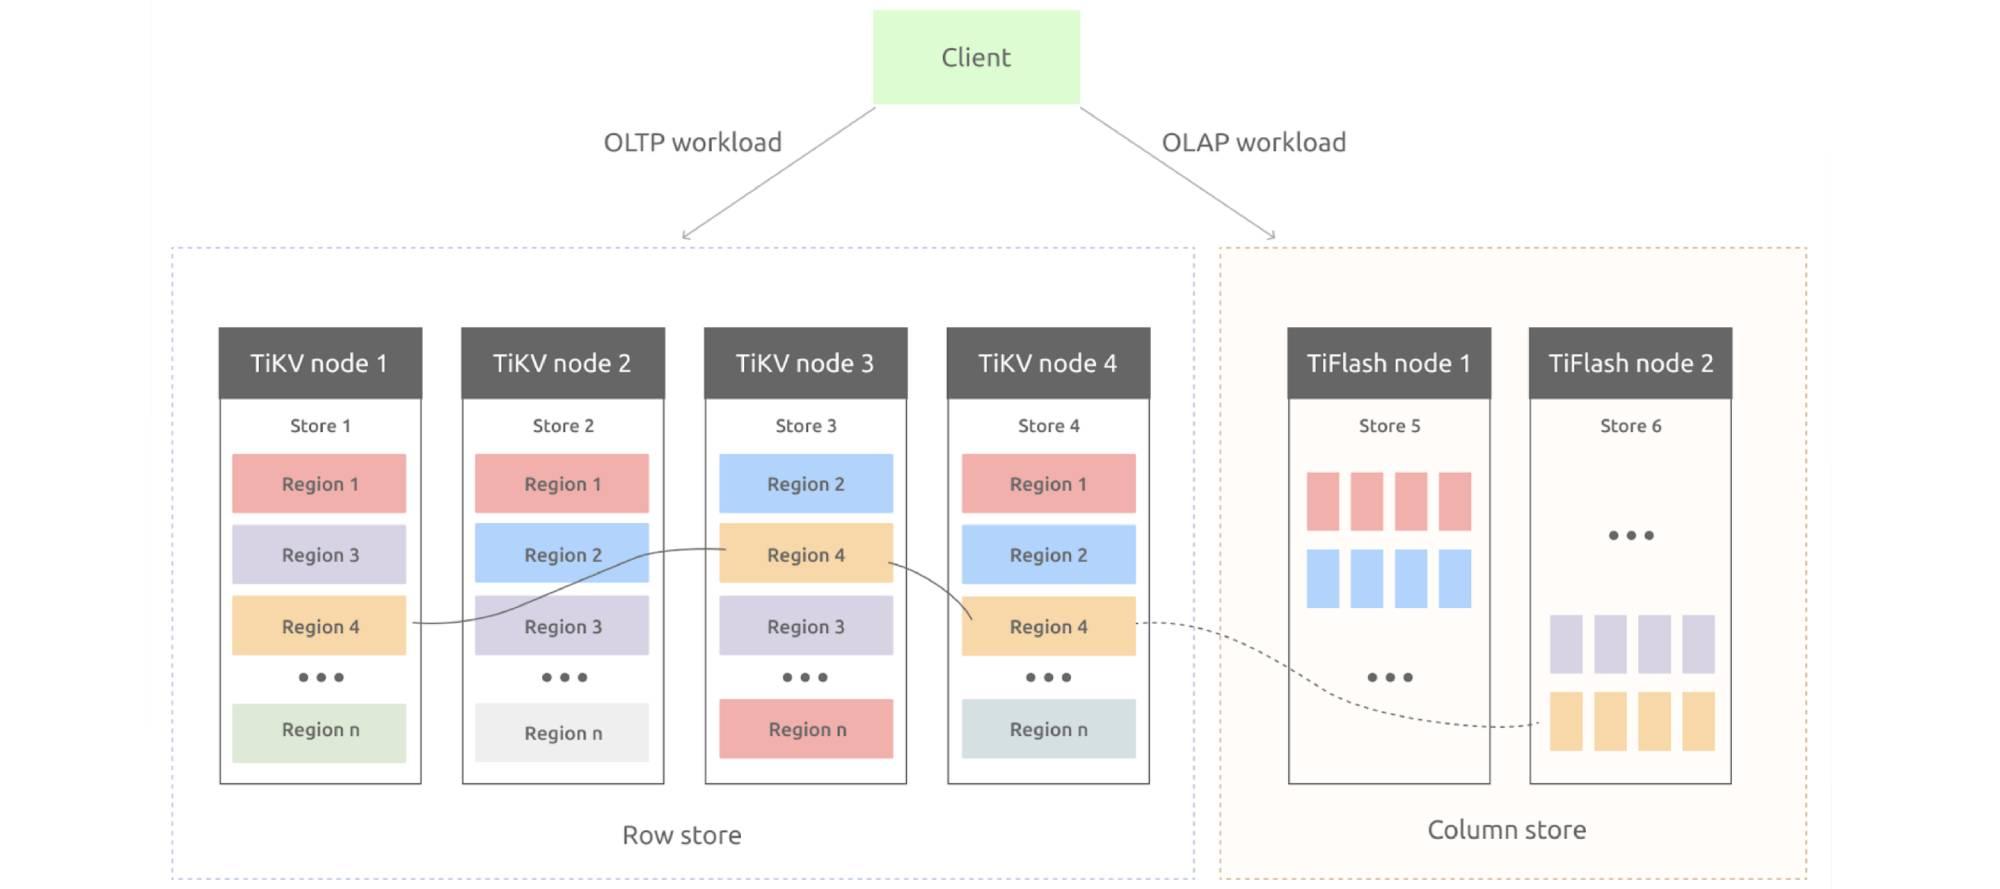 A Hybrid Transactional/Analytical Processing (HTAP) database